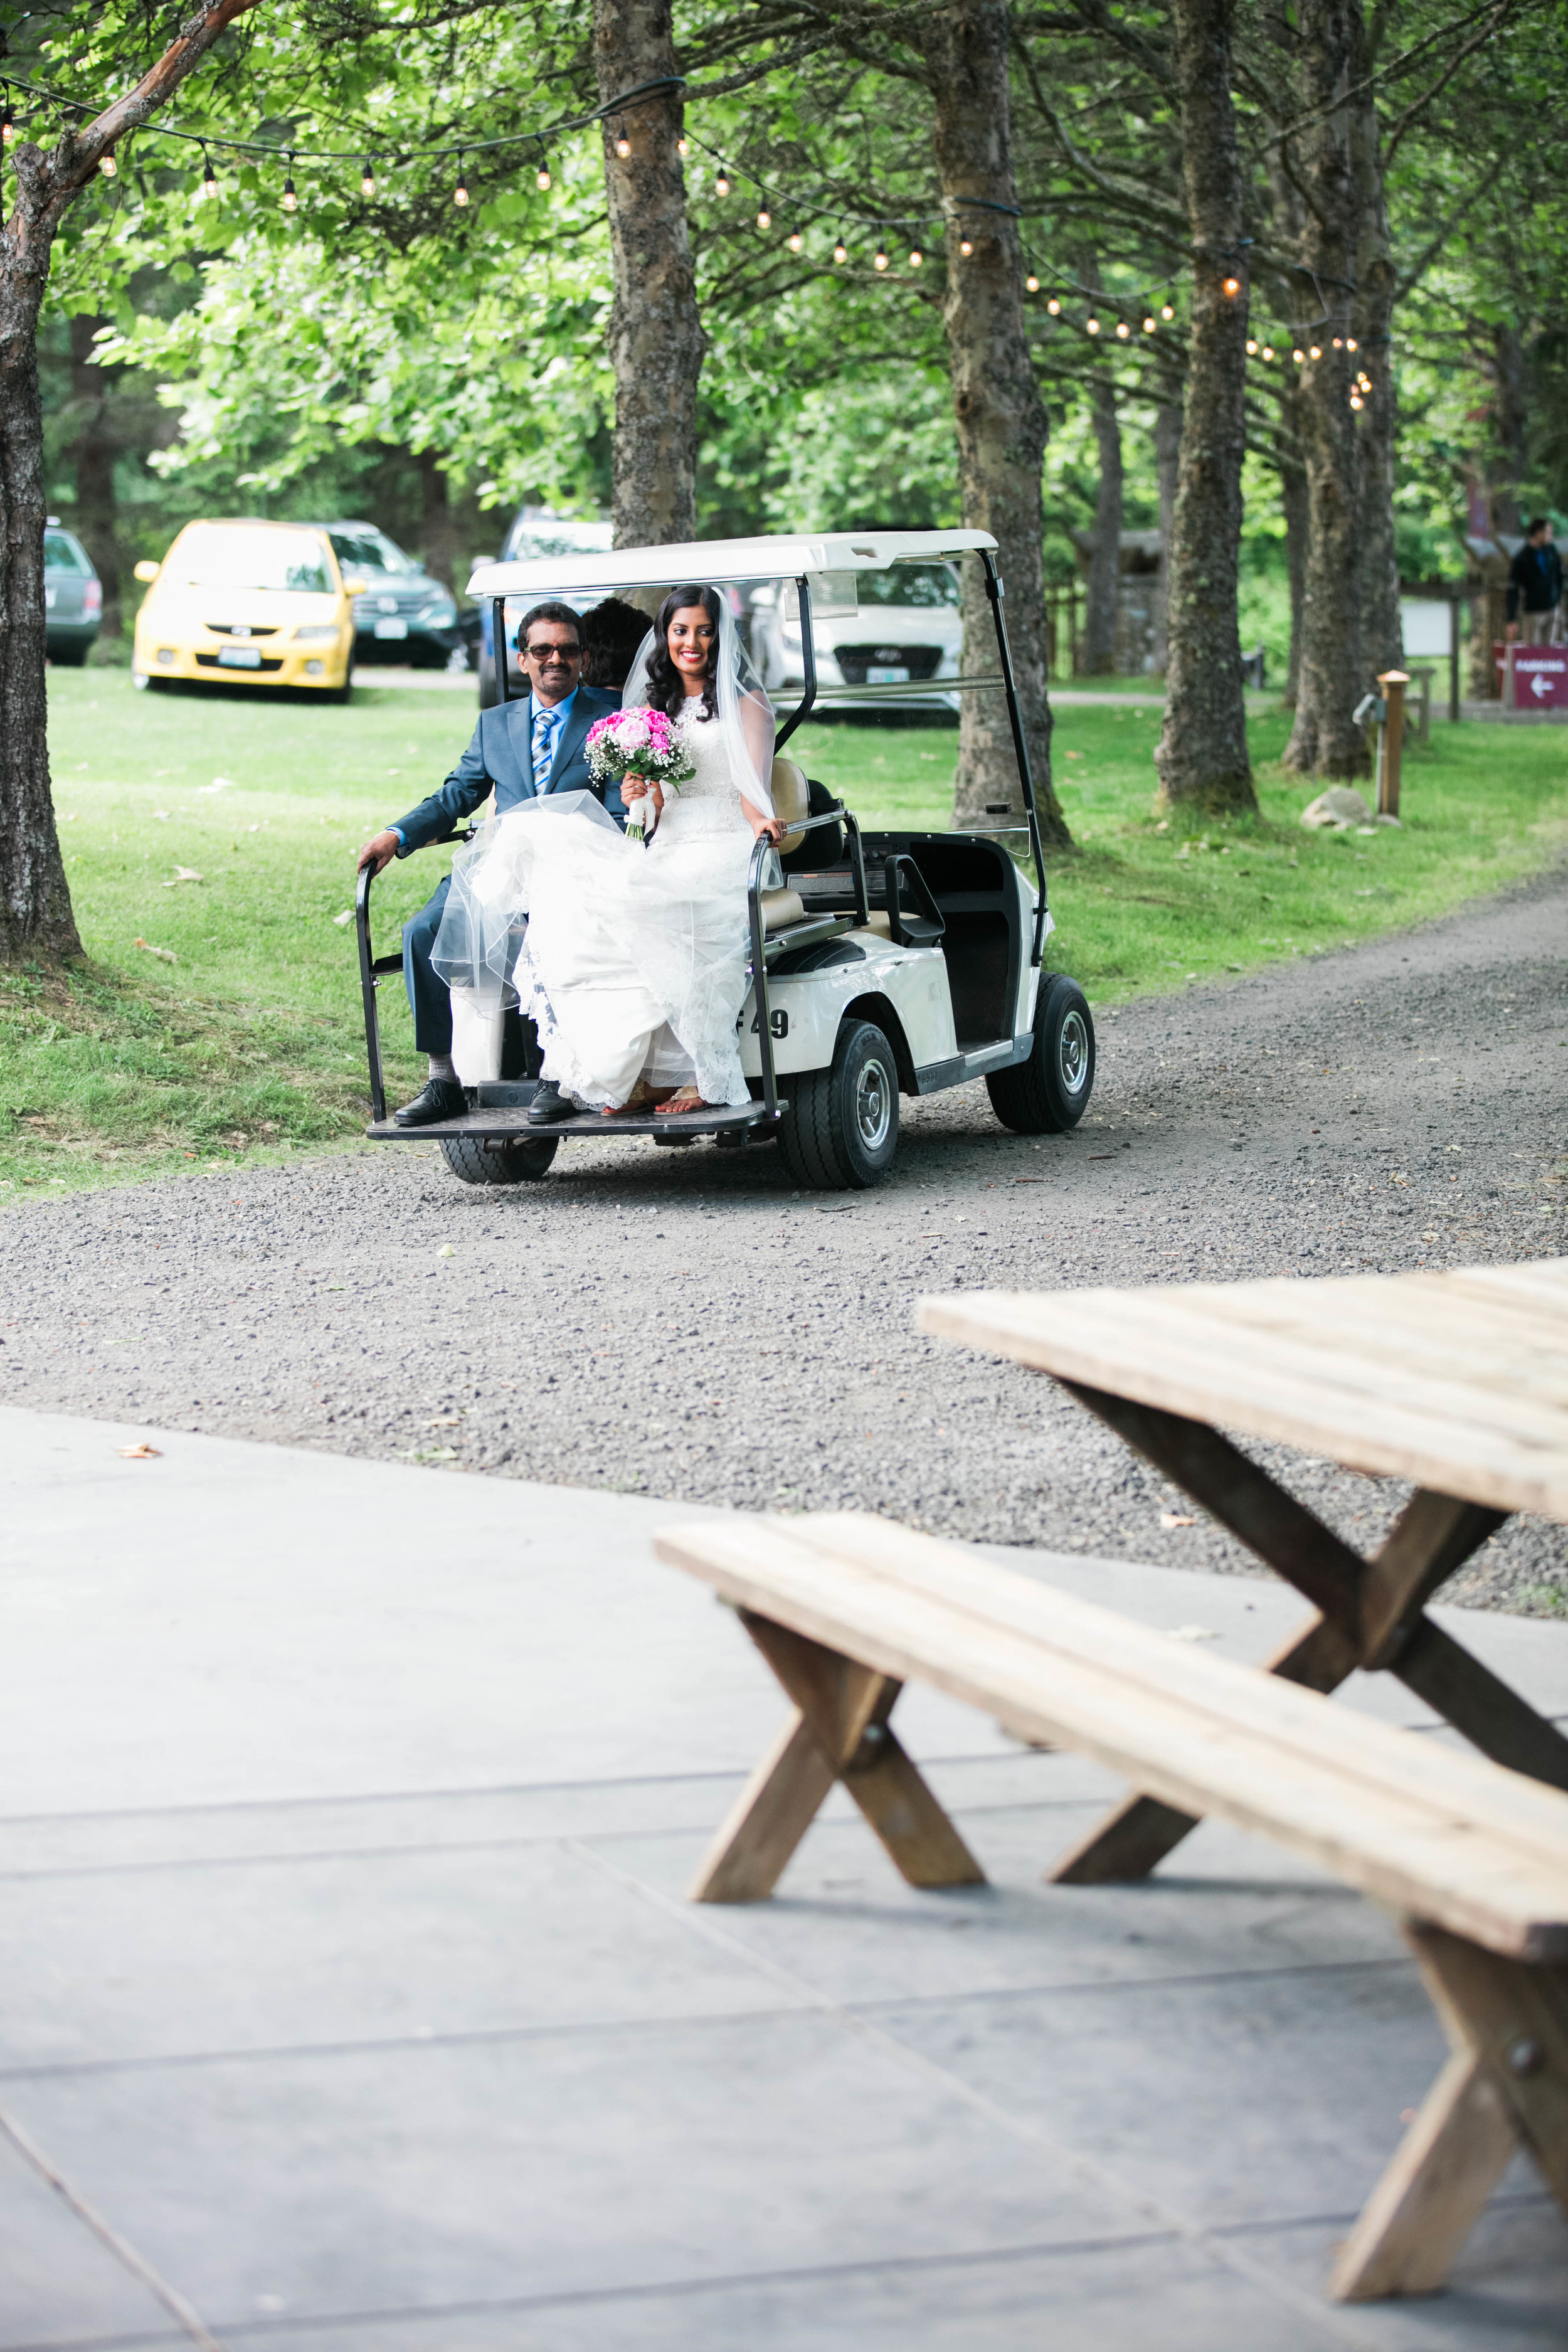 Hima+Dan_Wedding_Seattle+Couple_Kingston_6112016_1698.jpg